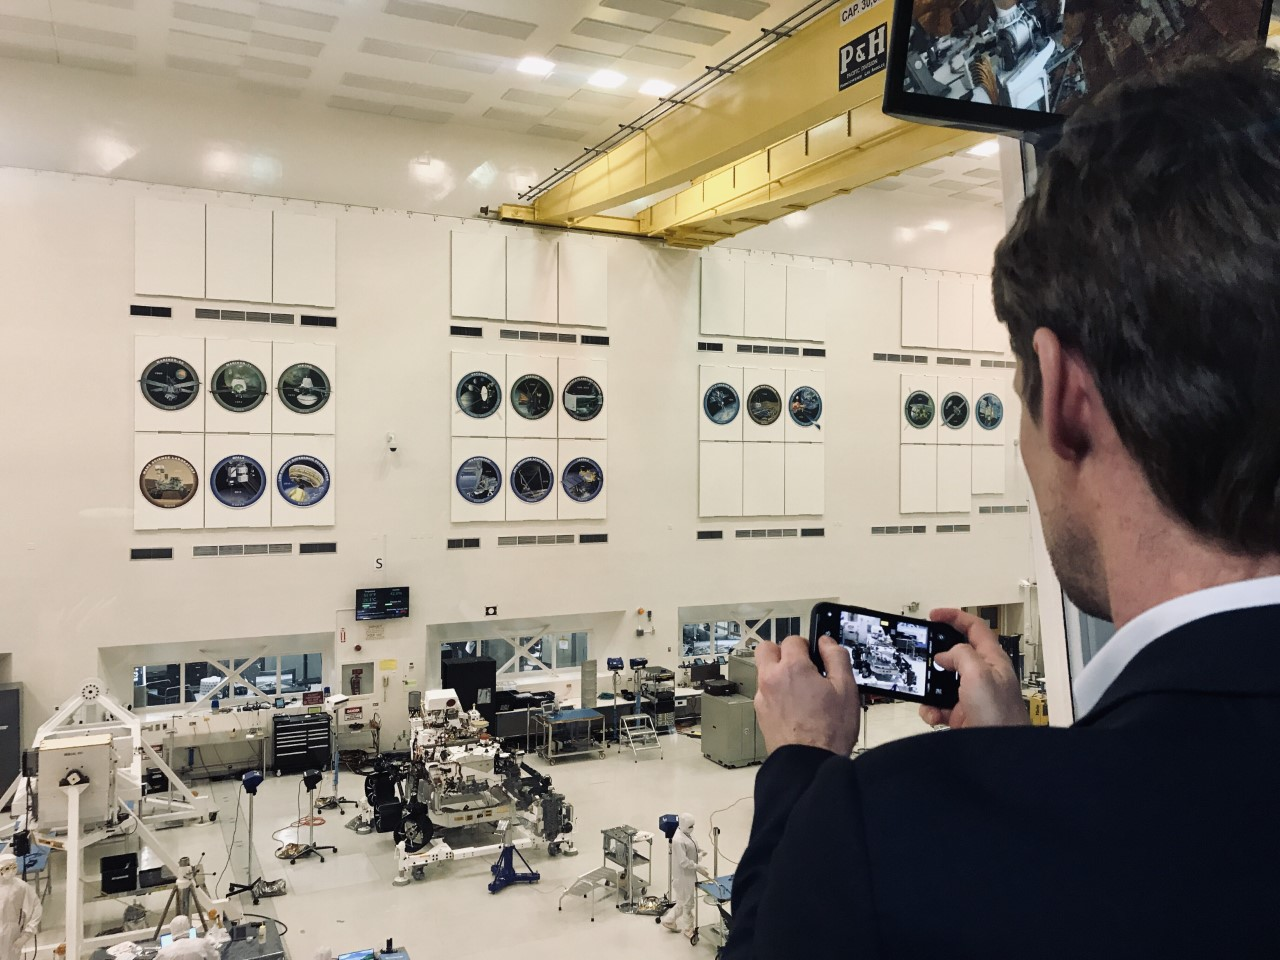 Nasa S Jet Propulsion Lab Cnes Continue Their Long Collaboration Consulat General De France A Los Angeles